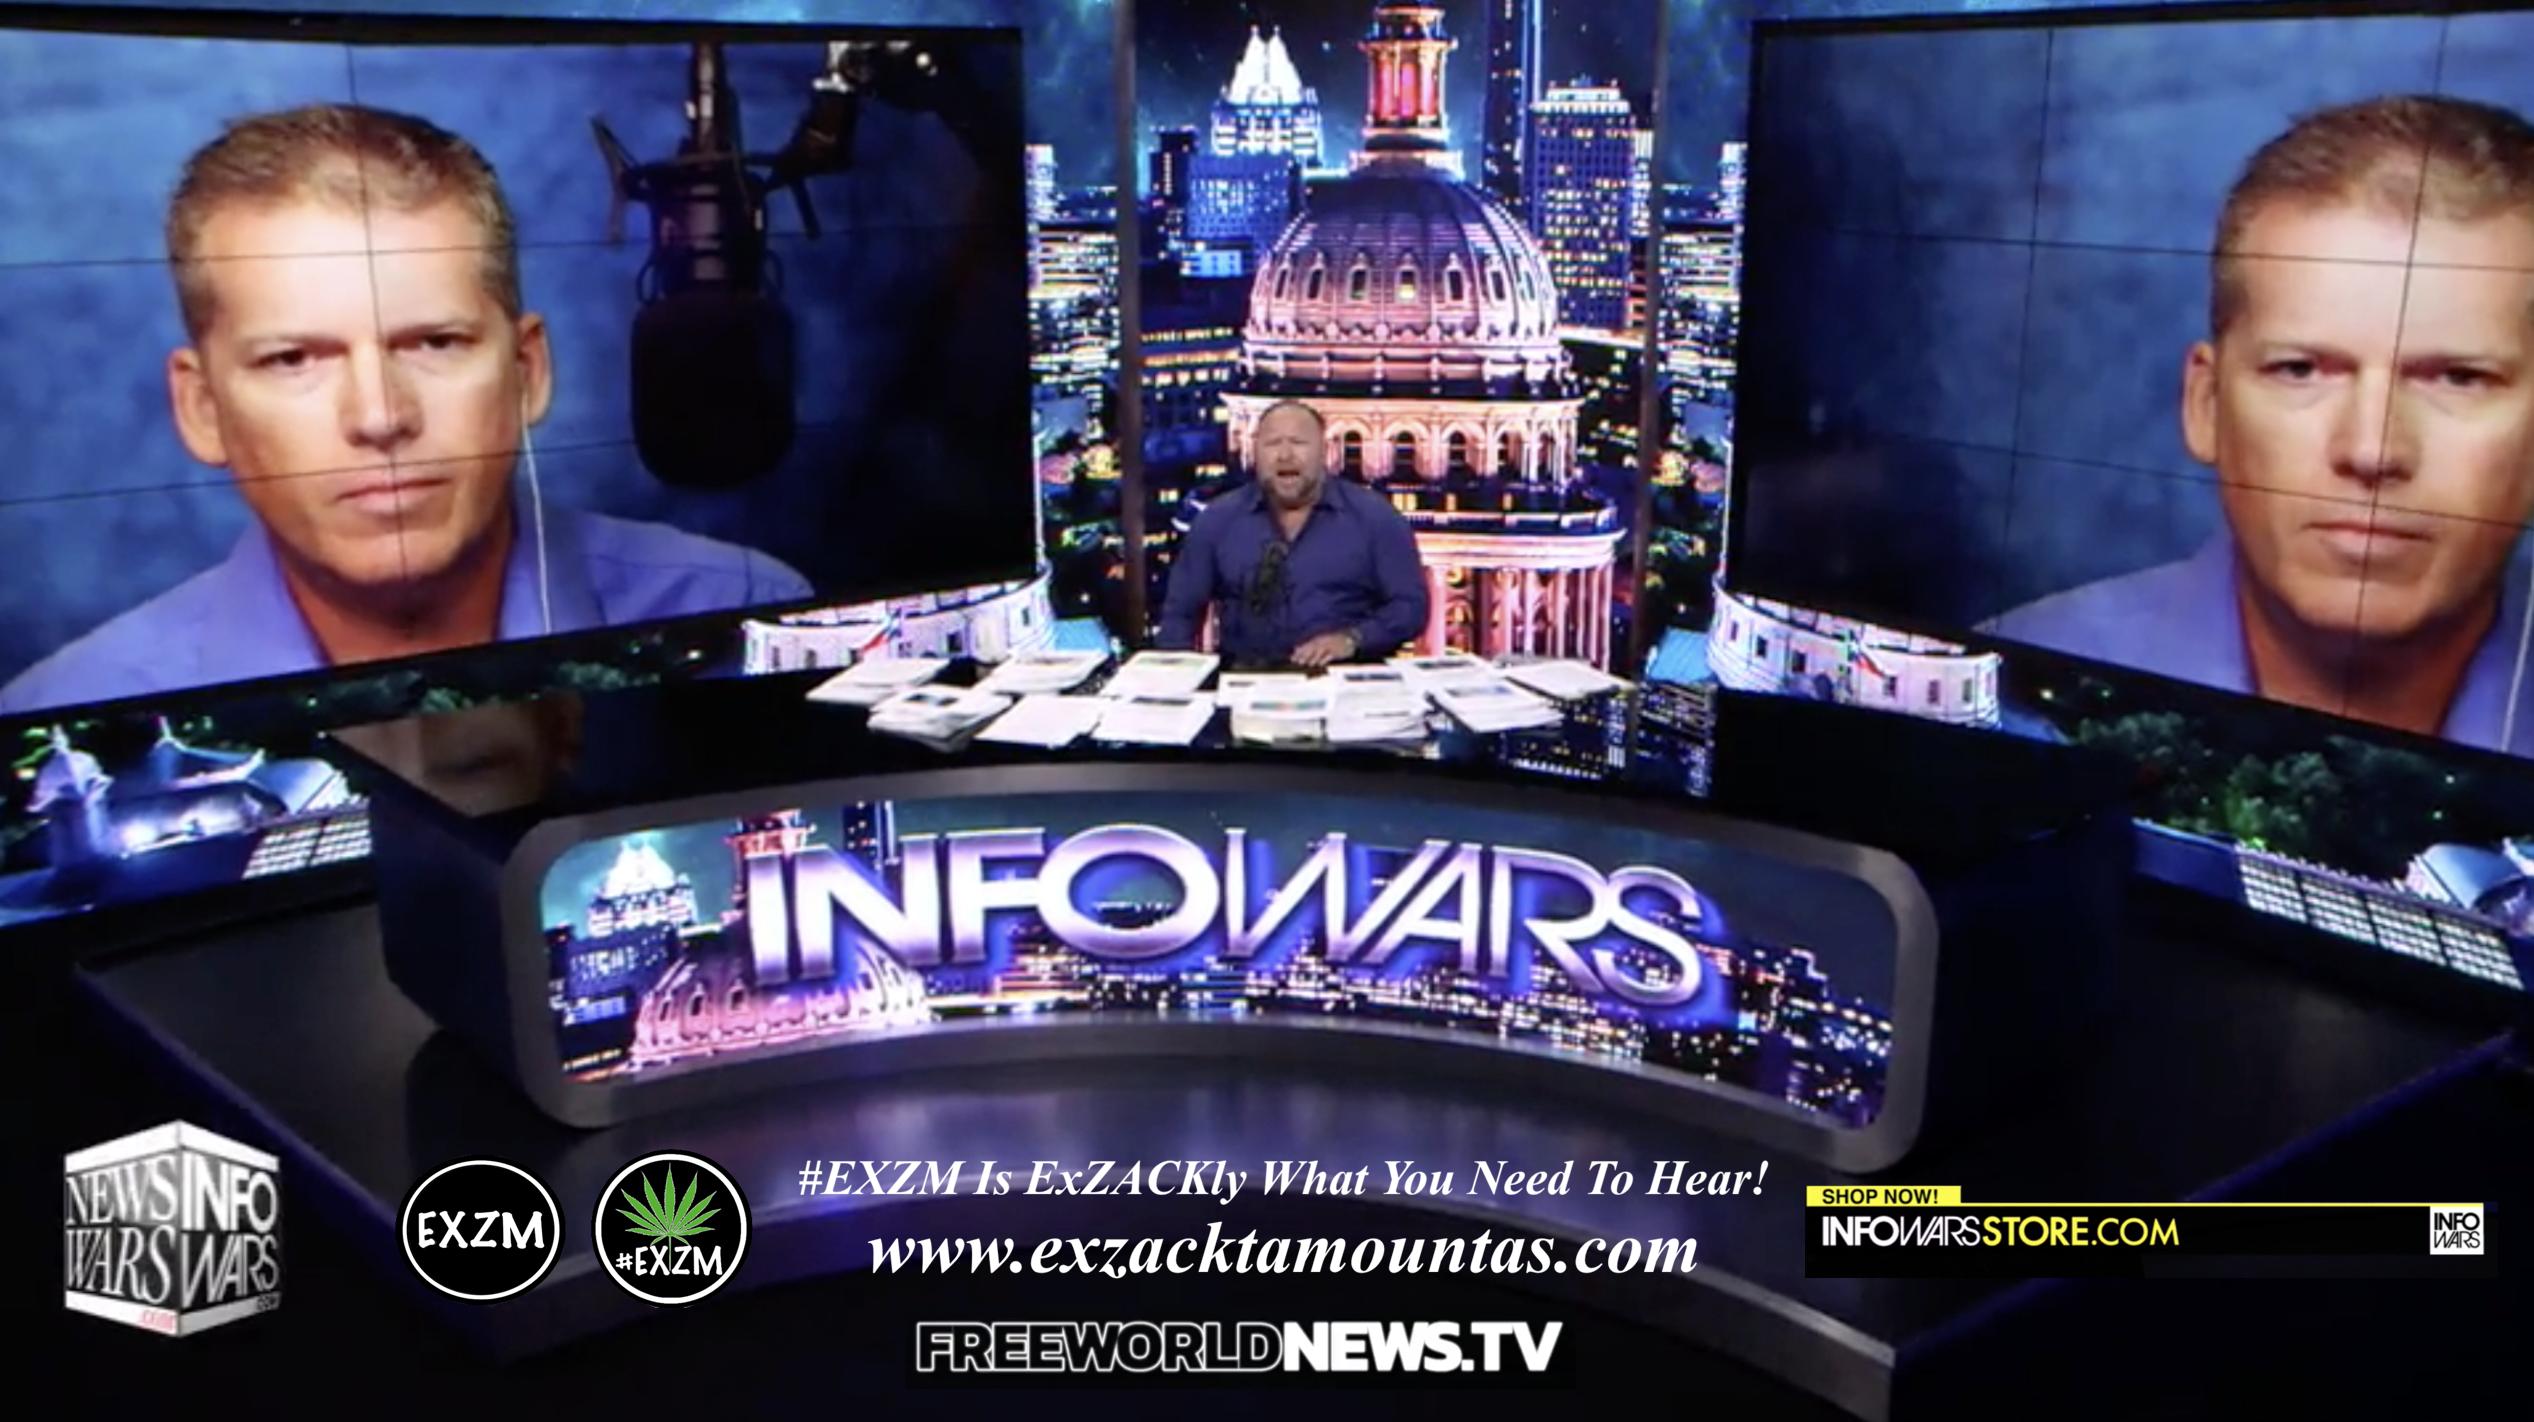 Alex Jones Mike Adams Live In Infowars Studio Free World News TV EXZM Zack Mount August 9th 2021 copy